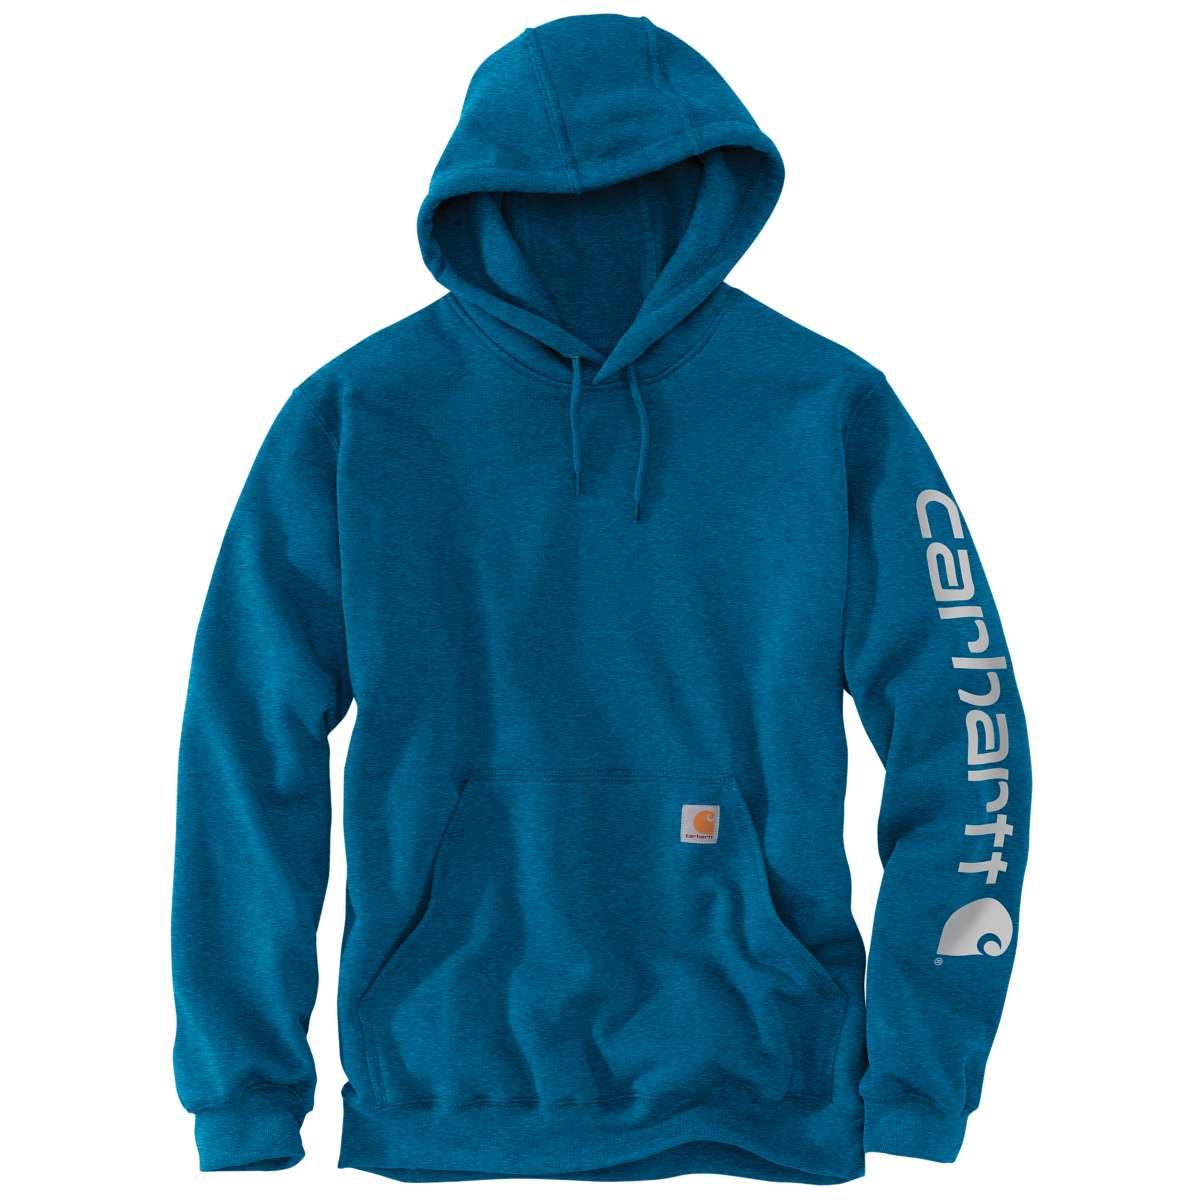 Carhartt Men's K288 Signature Sleeve Logo Hoodie, Extended Sizes - Blue, XLT